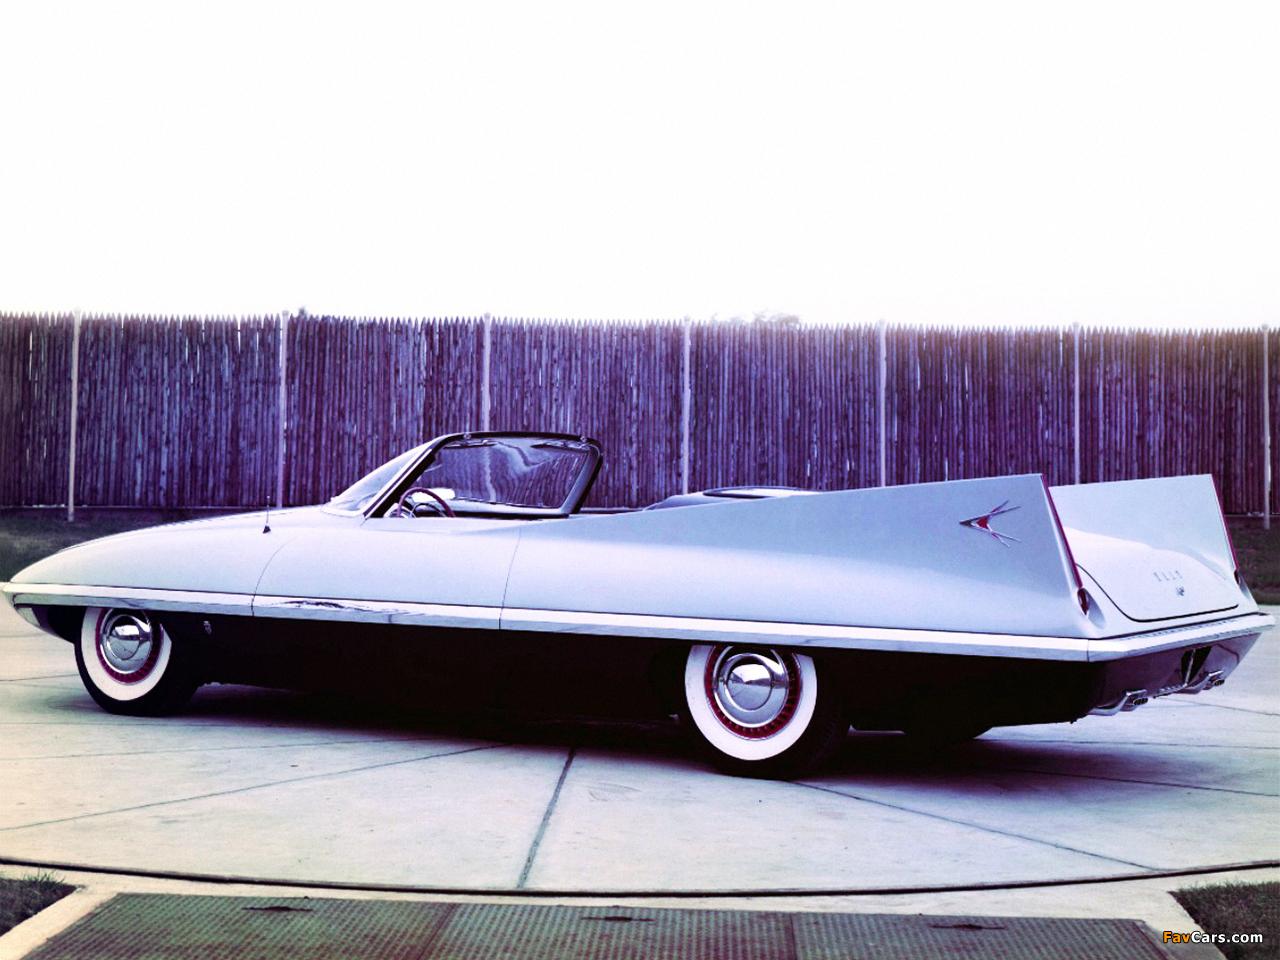 Images of Chrysler Dart Concept Car 1956 (1280 x 960)